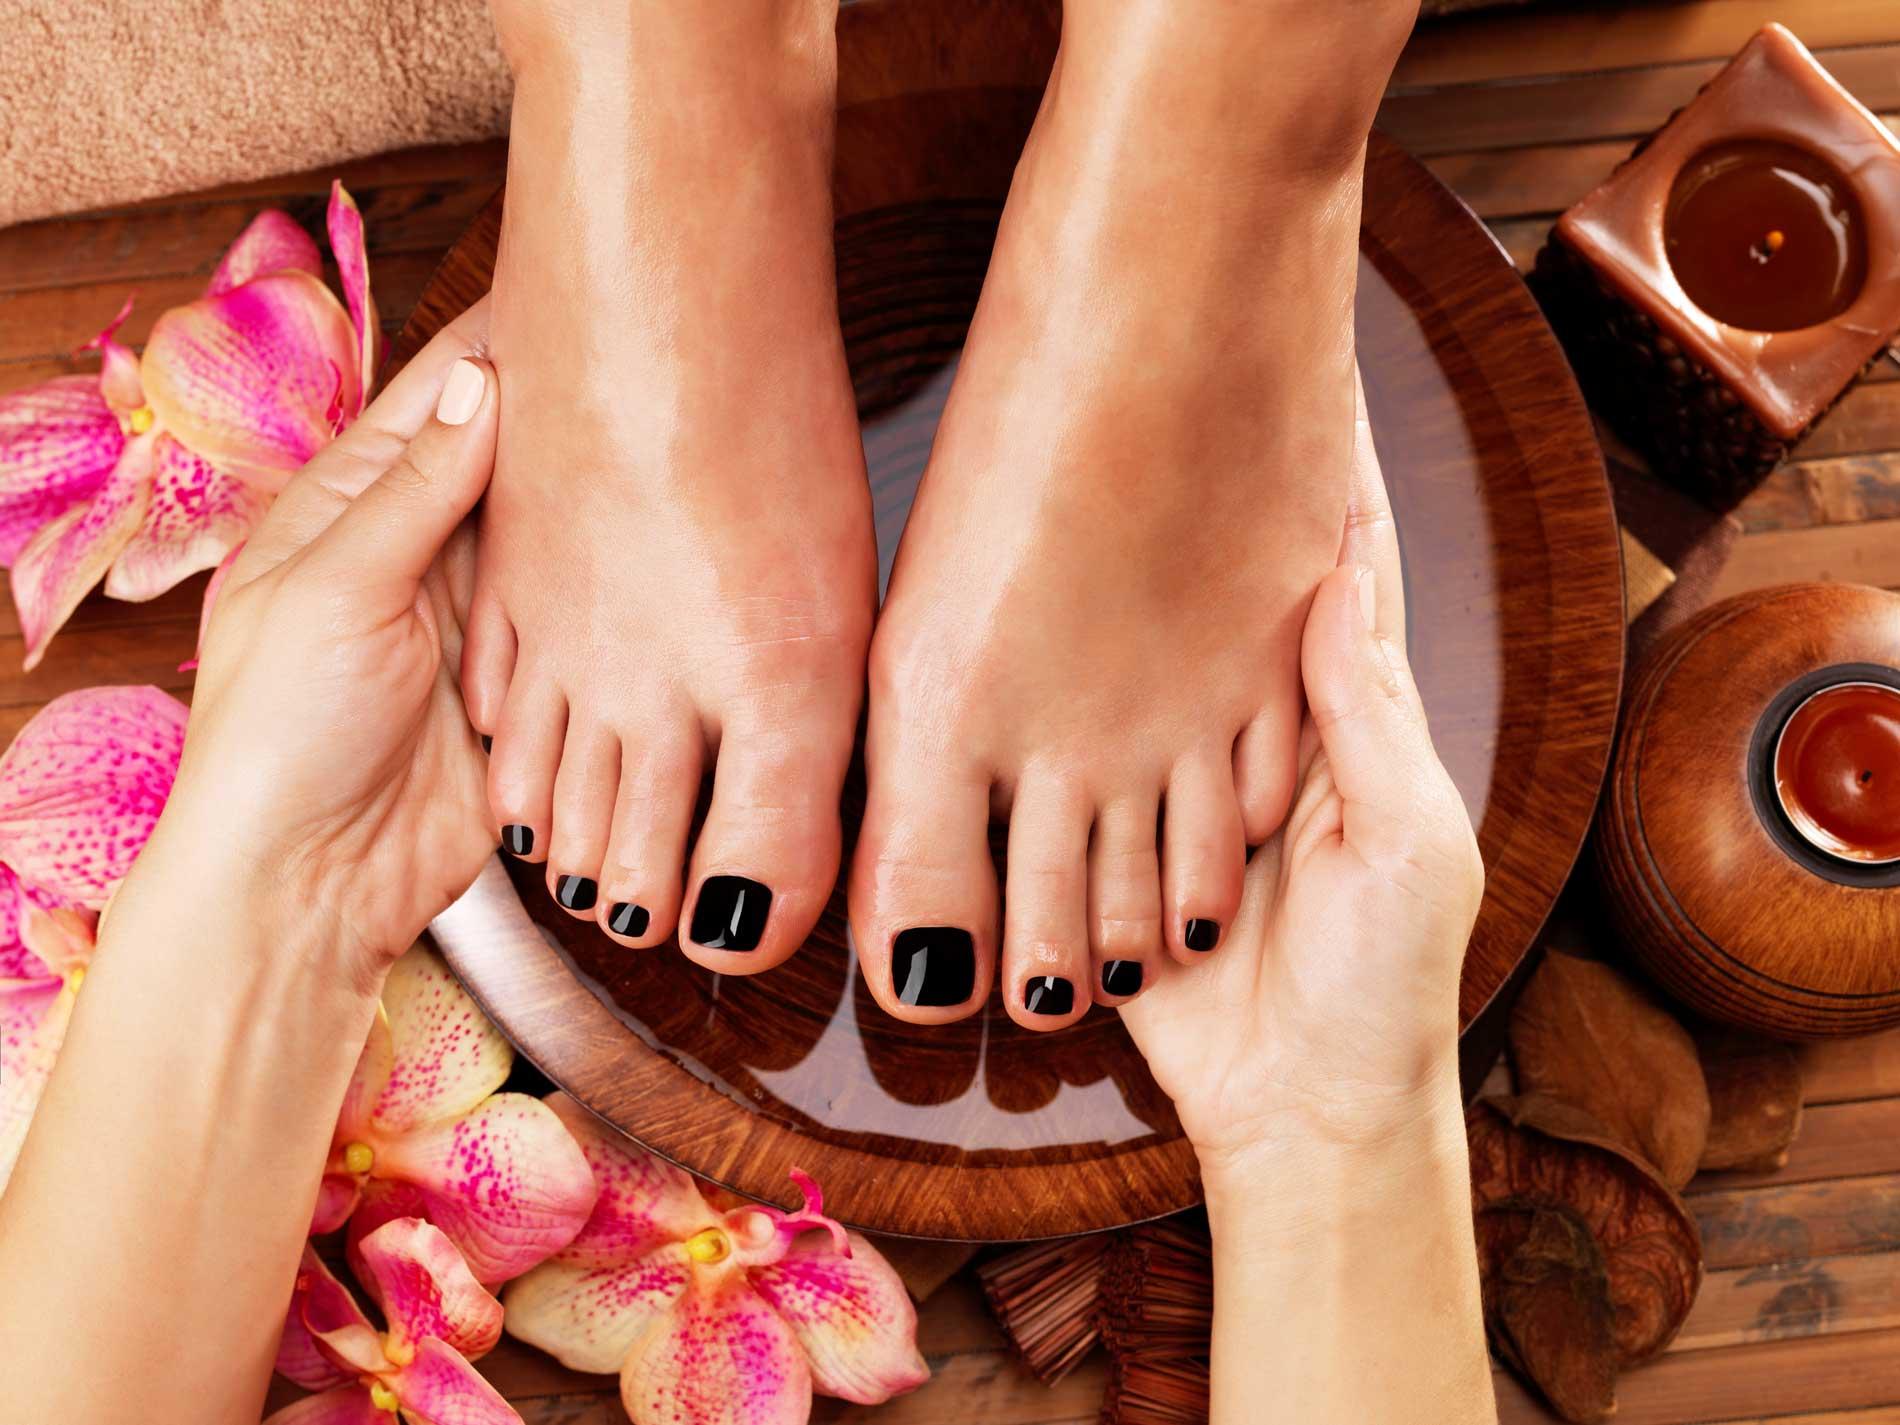 Женские ножки фото в домашних условиях